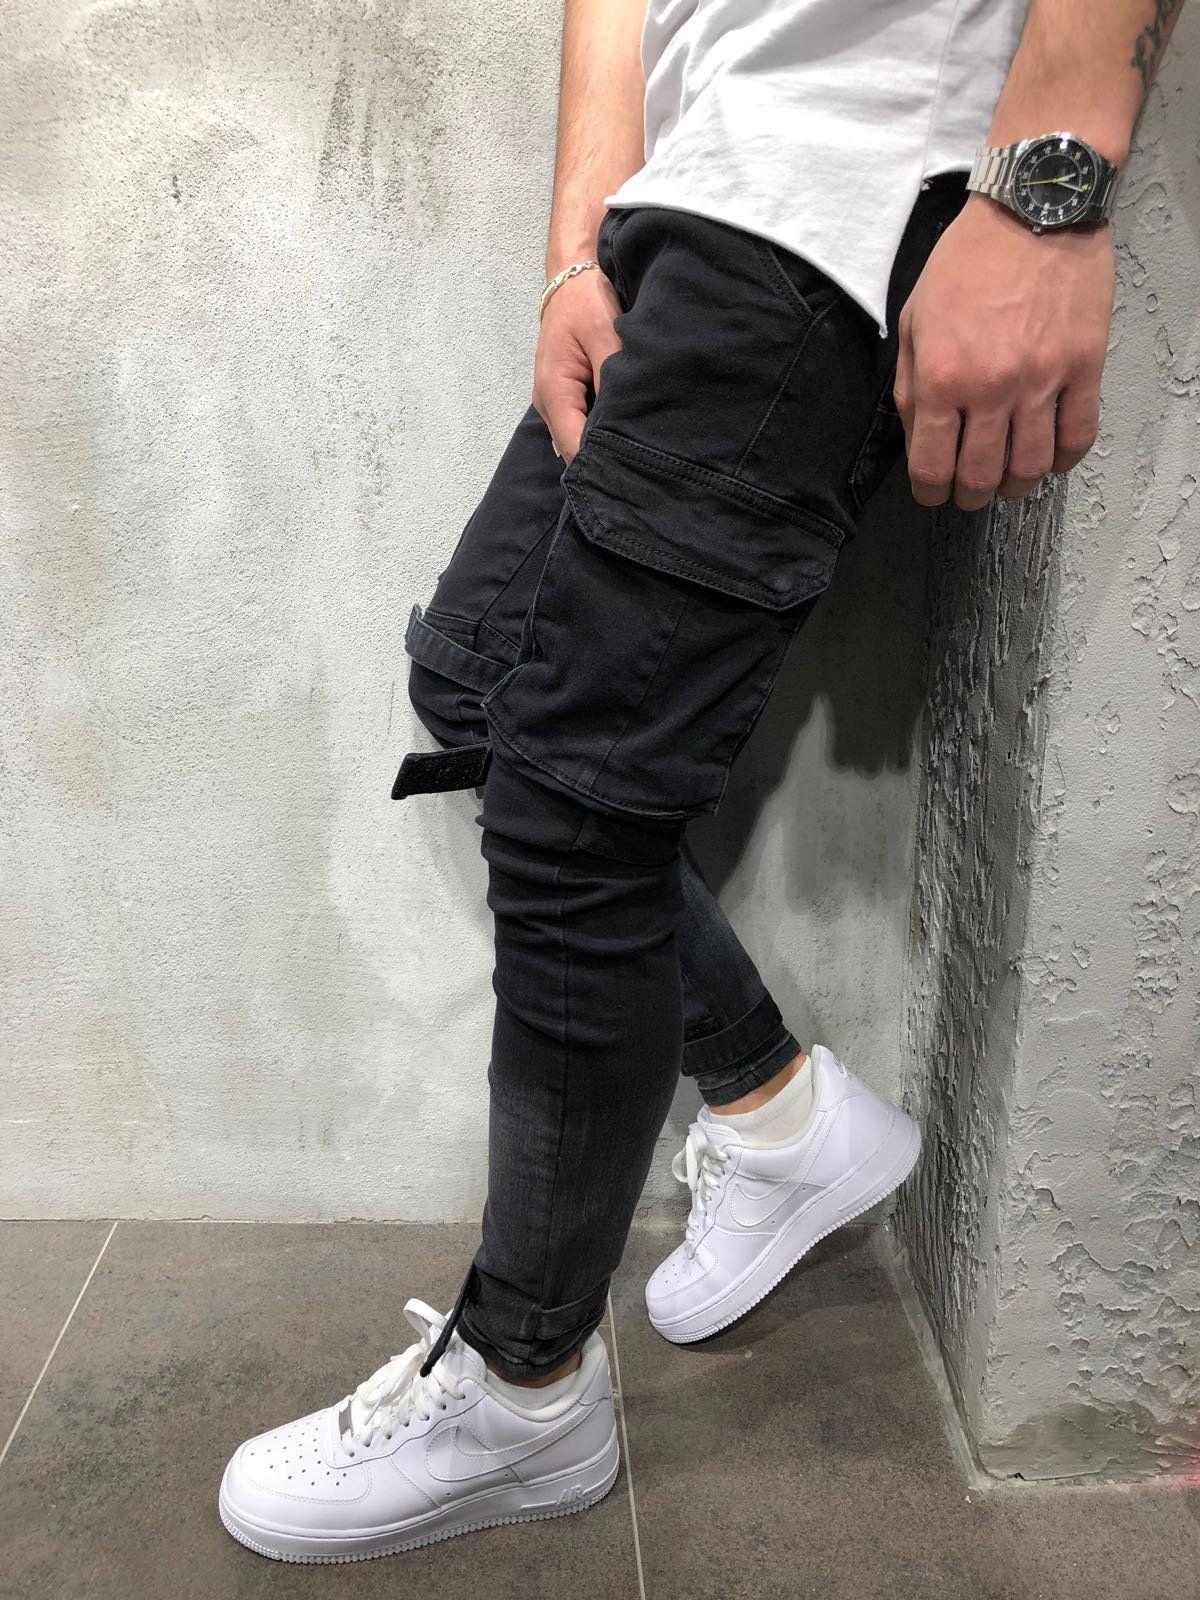 2019 Men Fashion Casual Harem Pant High Street Hip Hop Male Big Pocket Slim Fit Cargo Trousers Biker Pant Jogger Sweatpants